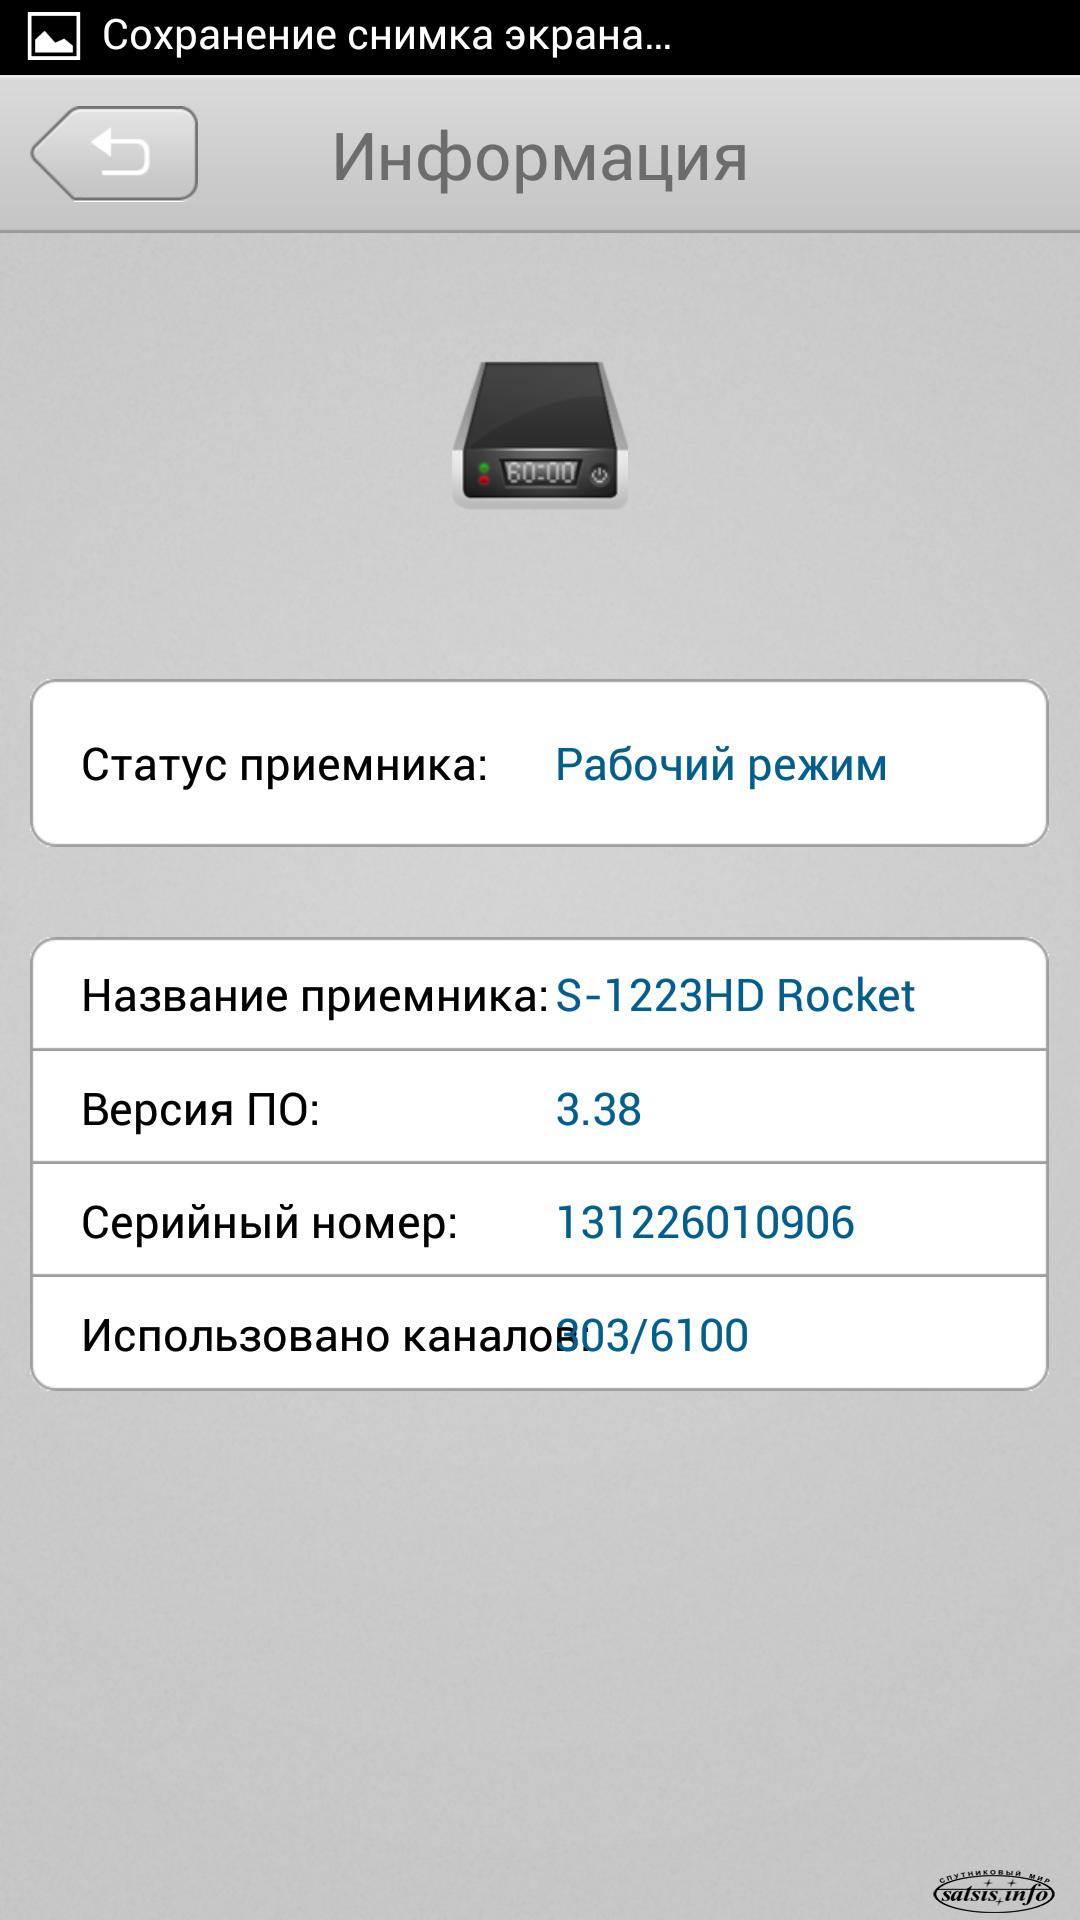 https://satsis.info/uploads/forum/posts/2014-06/1401808322_www.satsis.info_g_mscreen_8.png